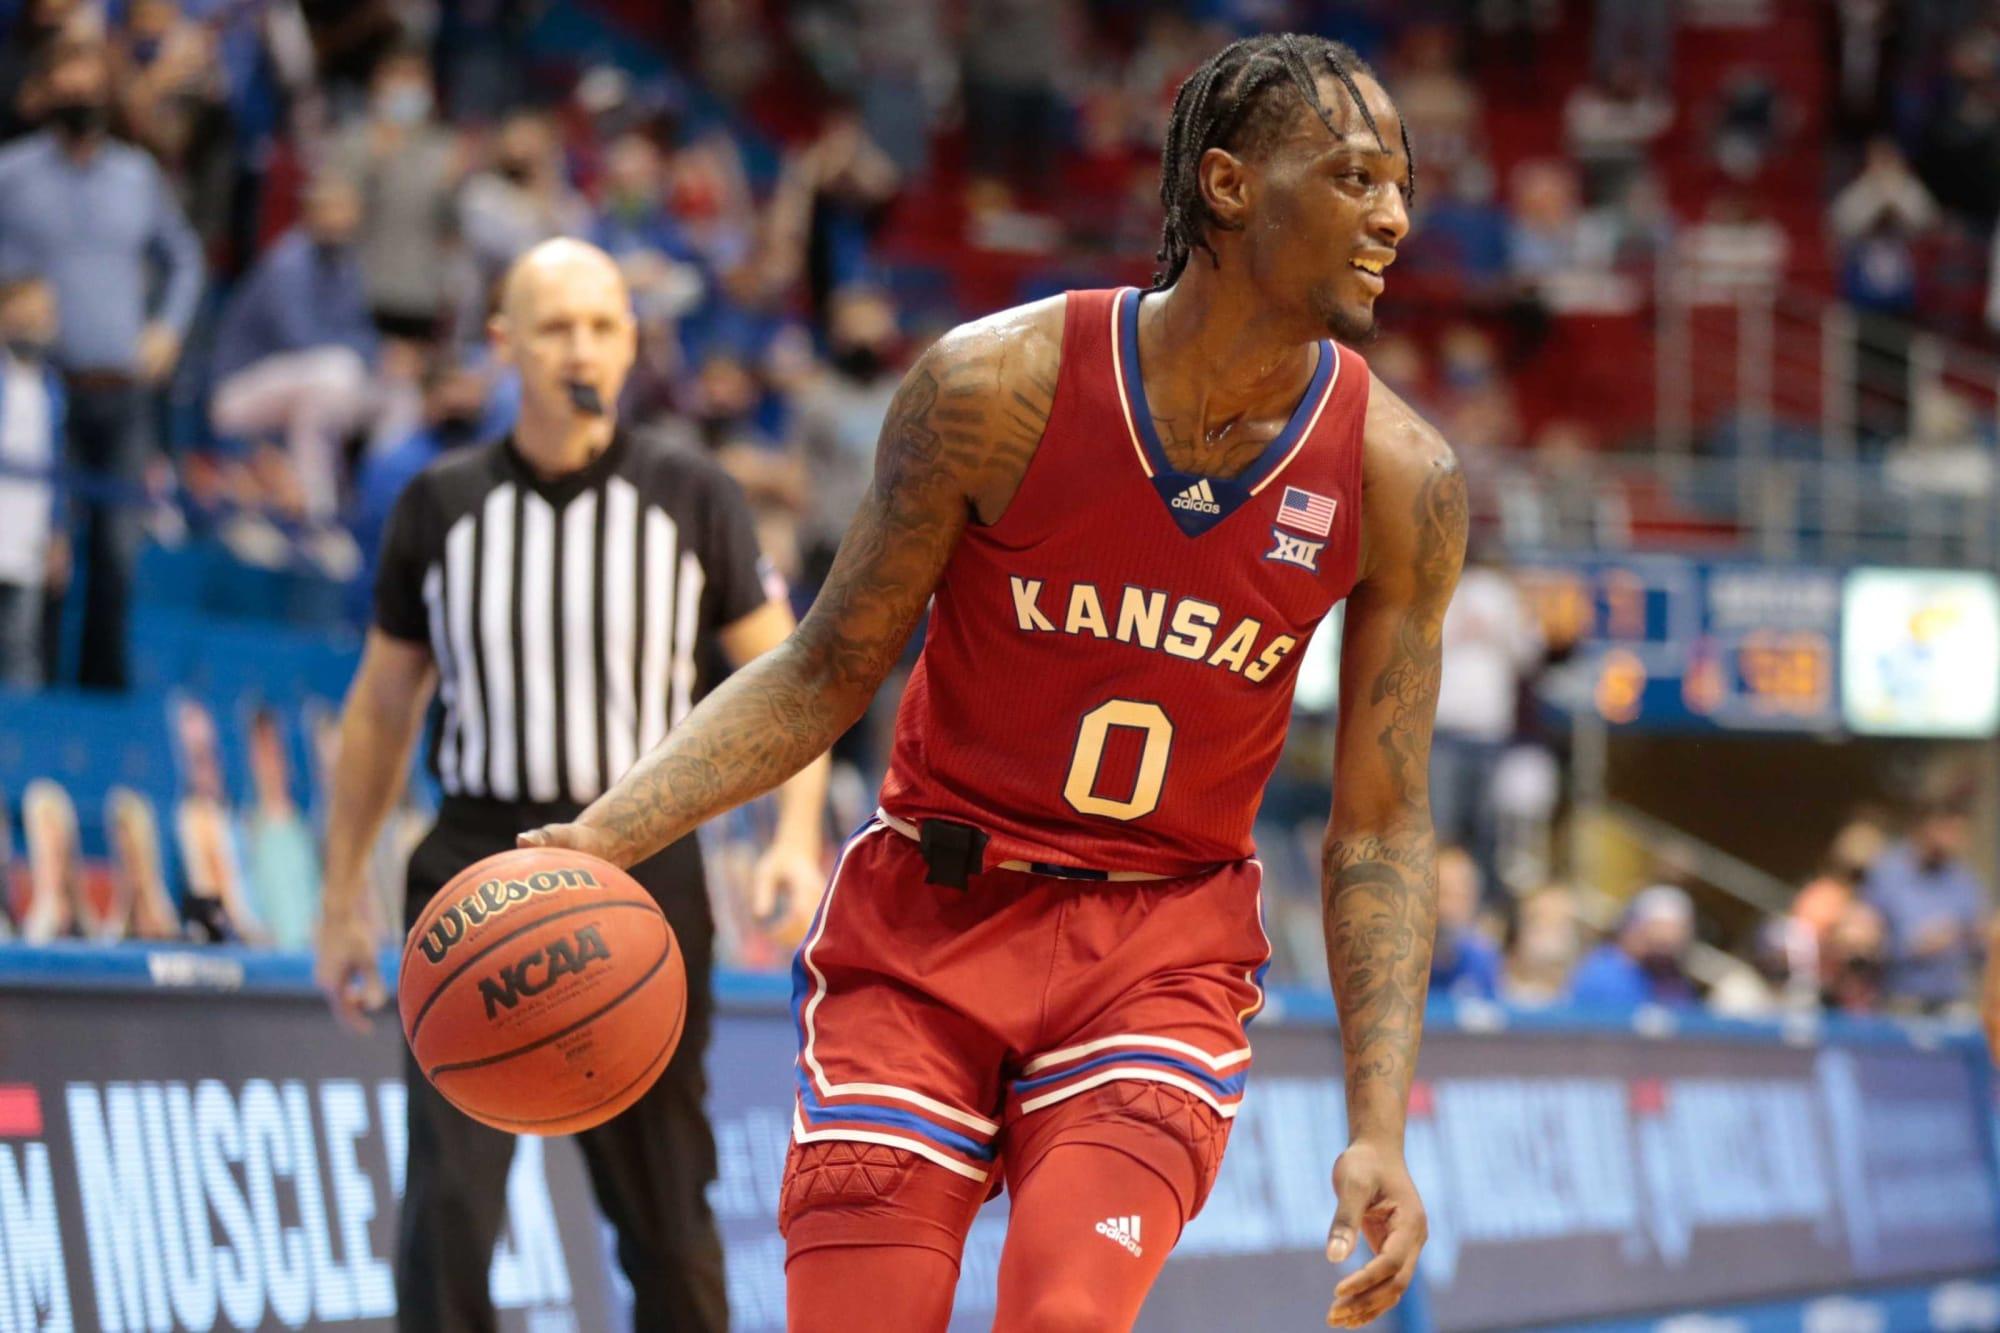 Kansas basketball: Expectations for Marcus Garrett ahead of the NBA Draft